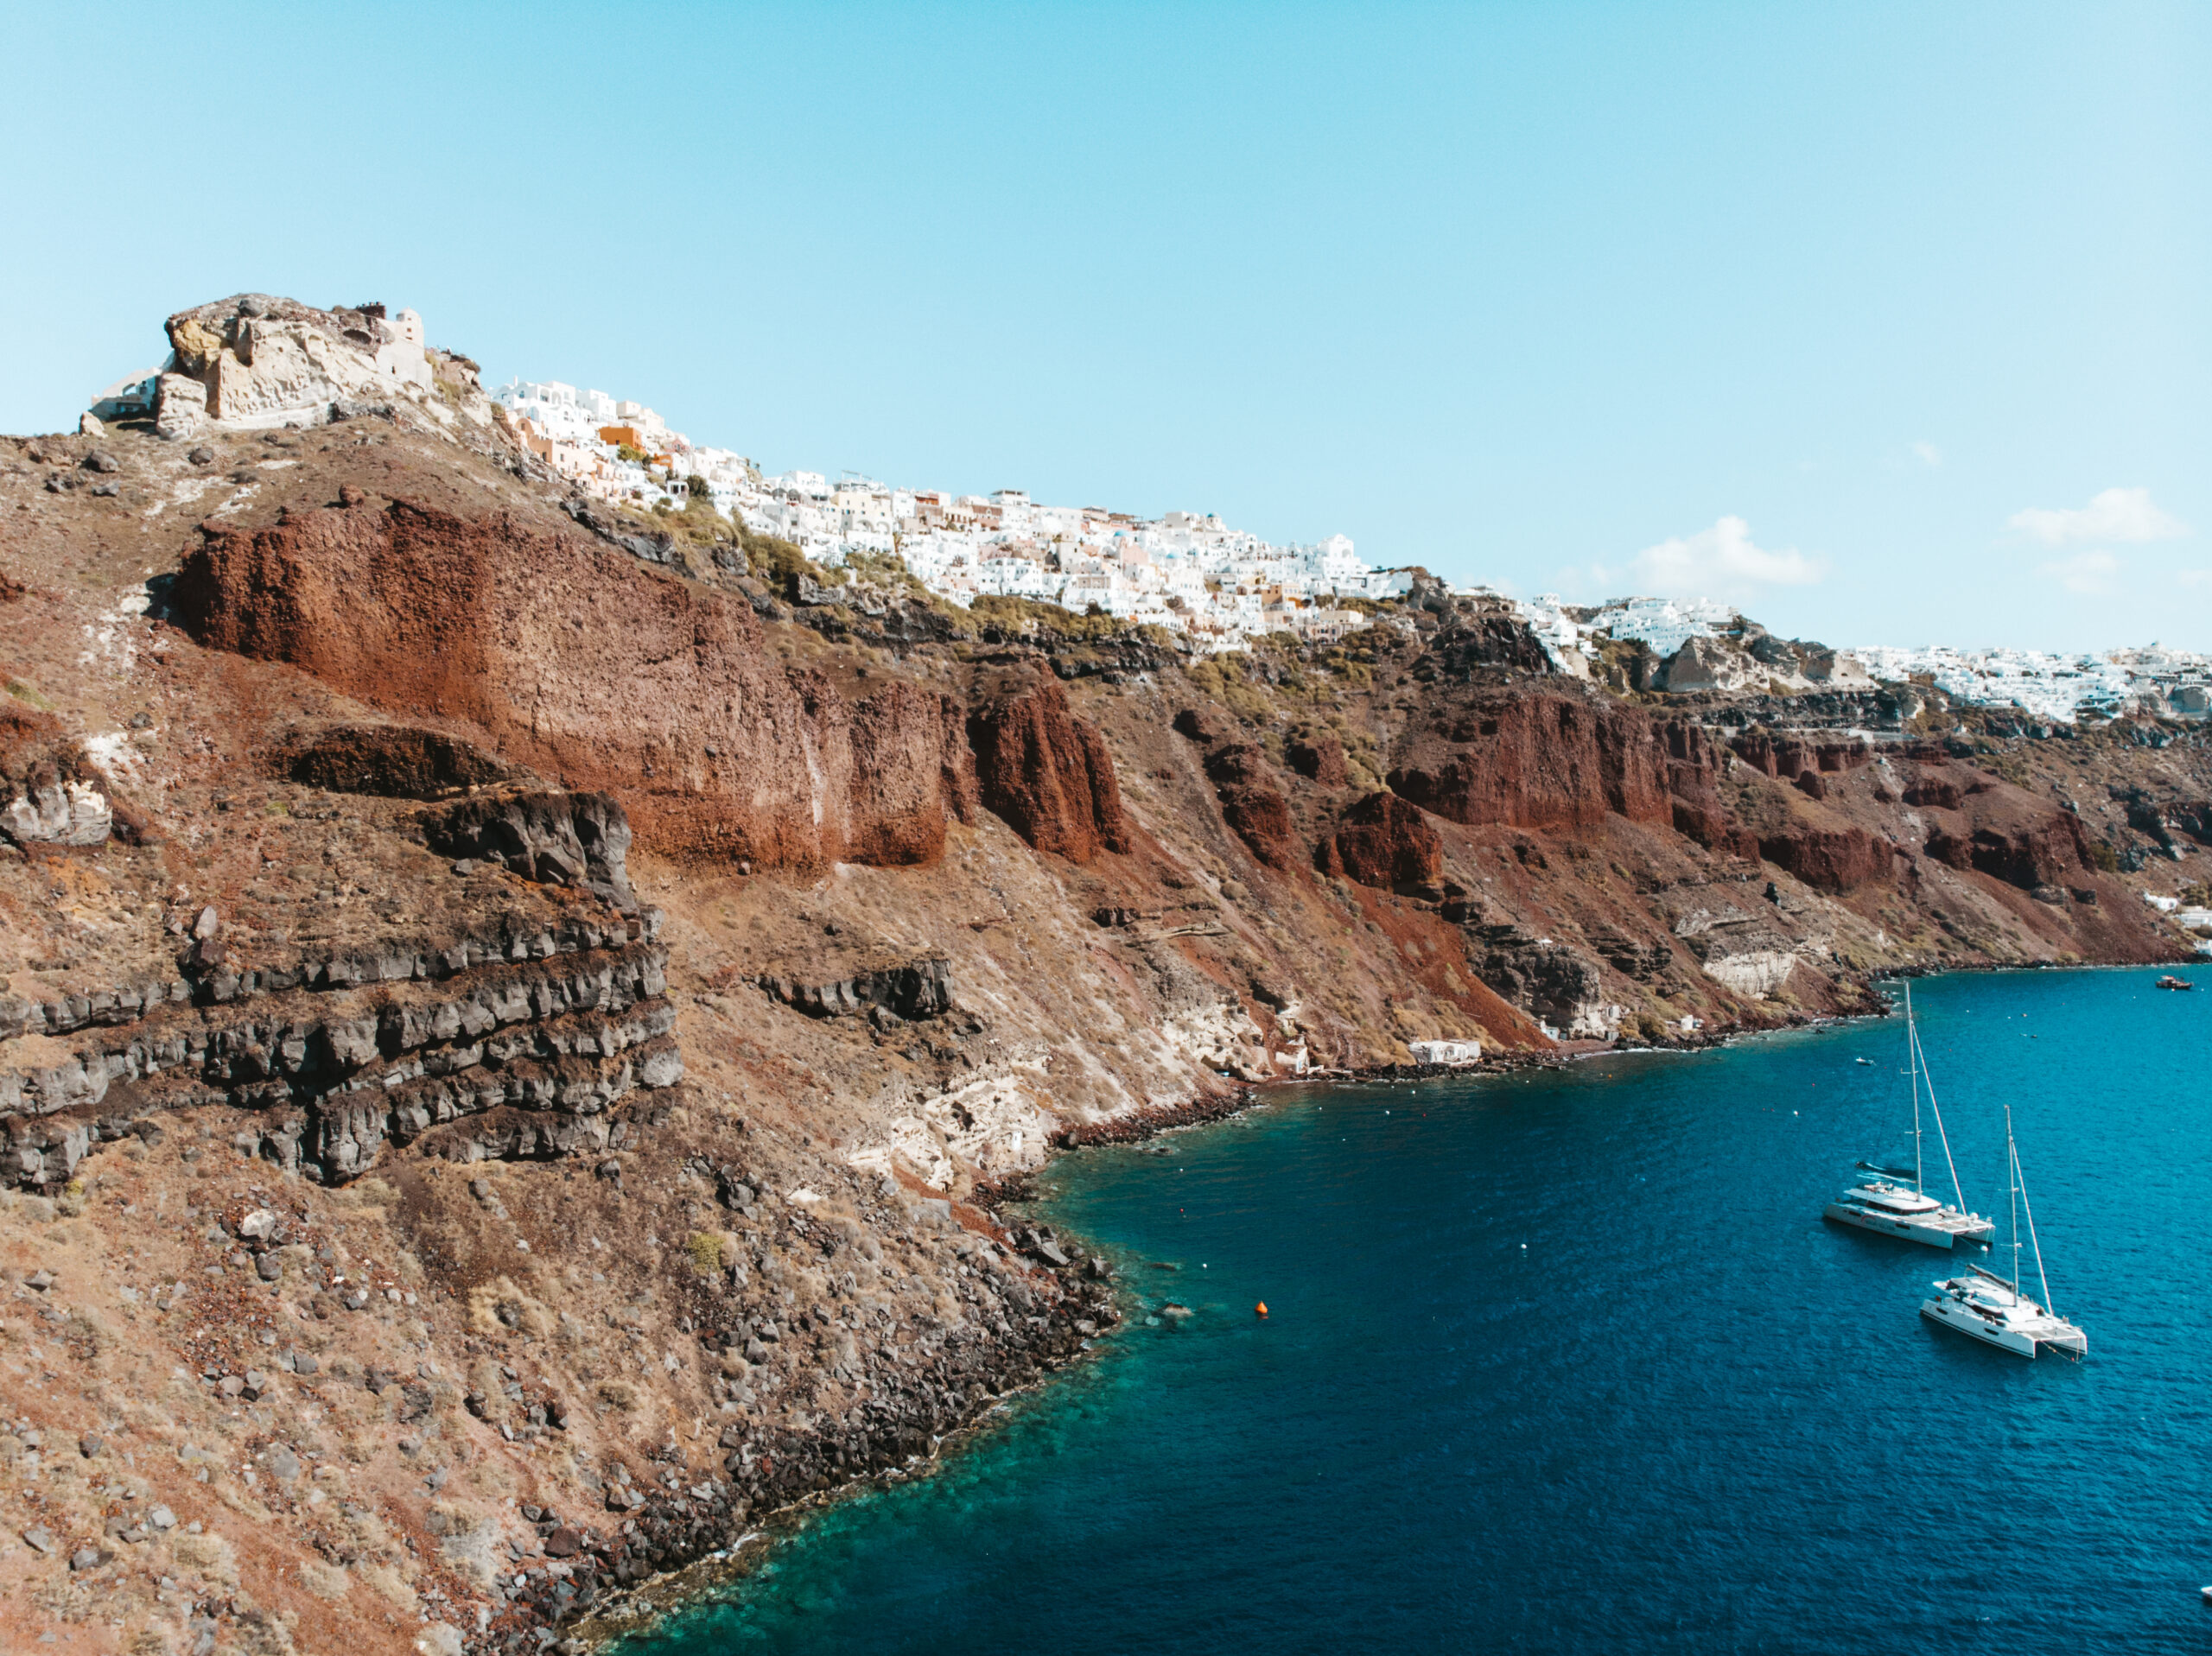 Oia from drone, Santorini z drona, Ammoudi bay, caldera, kaldera